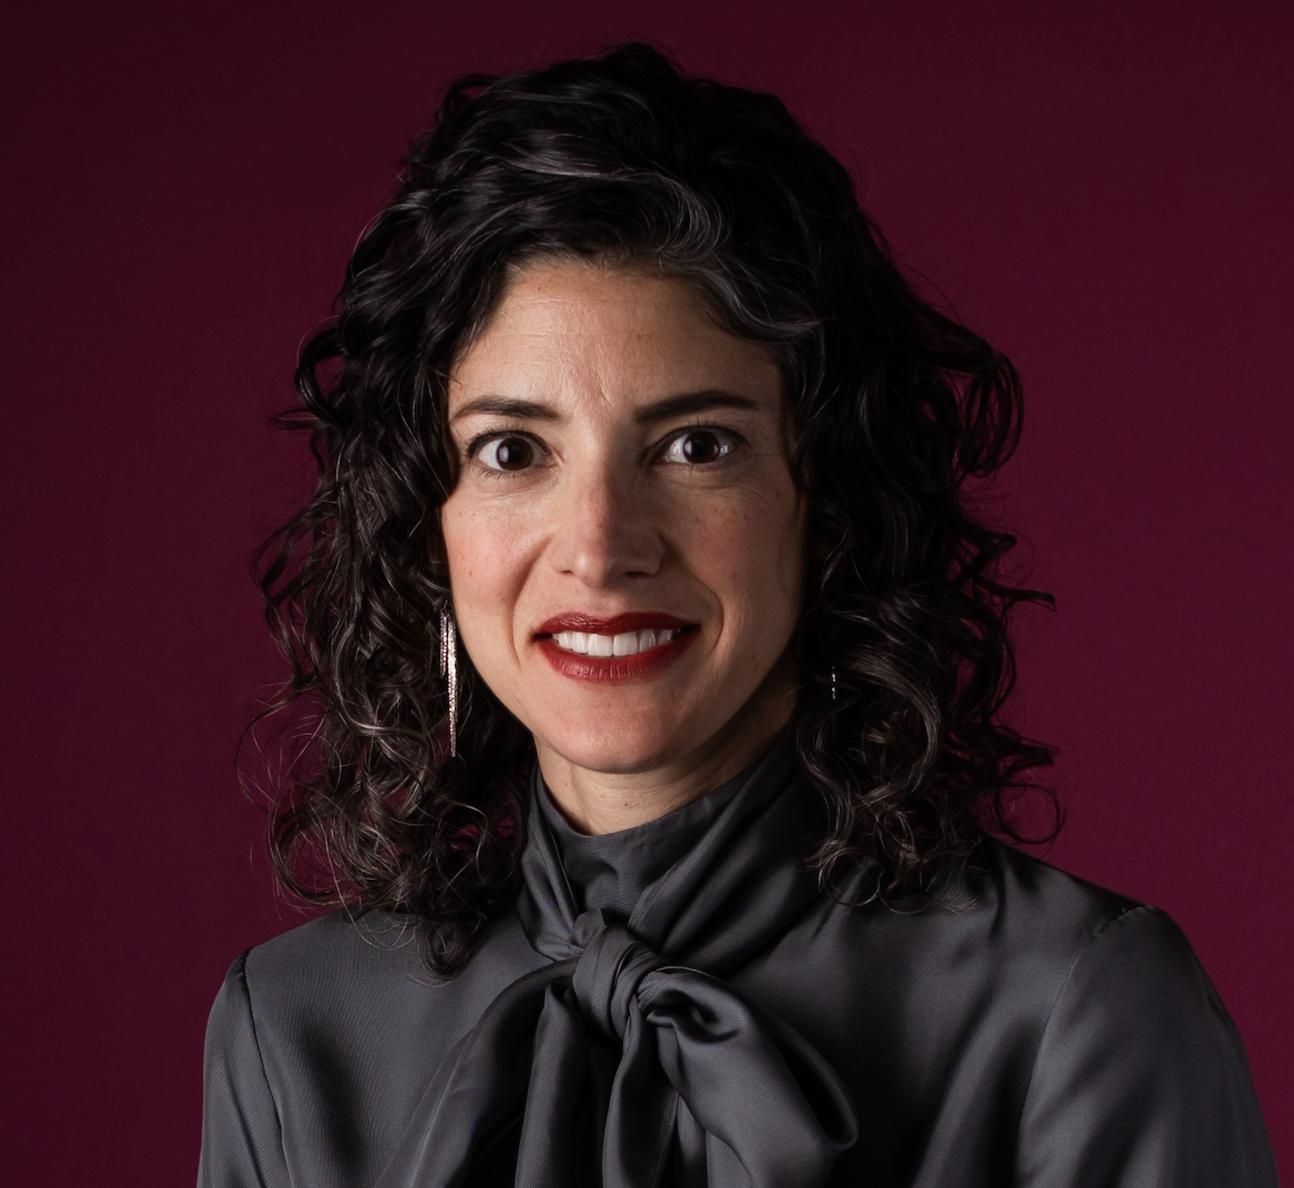 Julie Scelfo